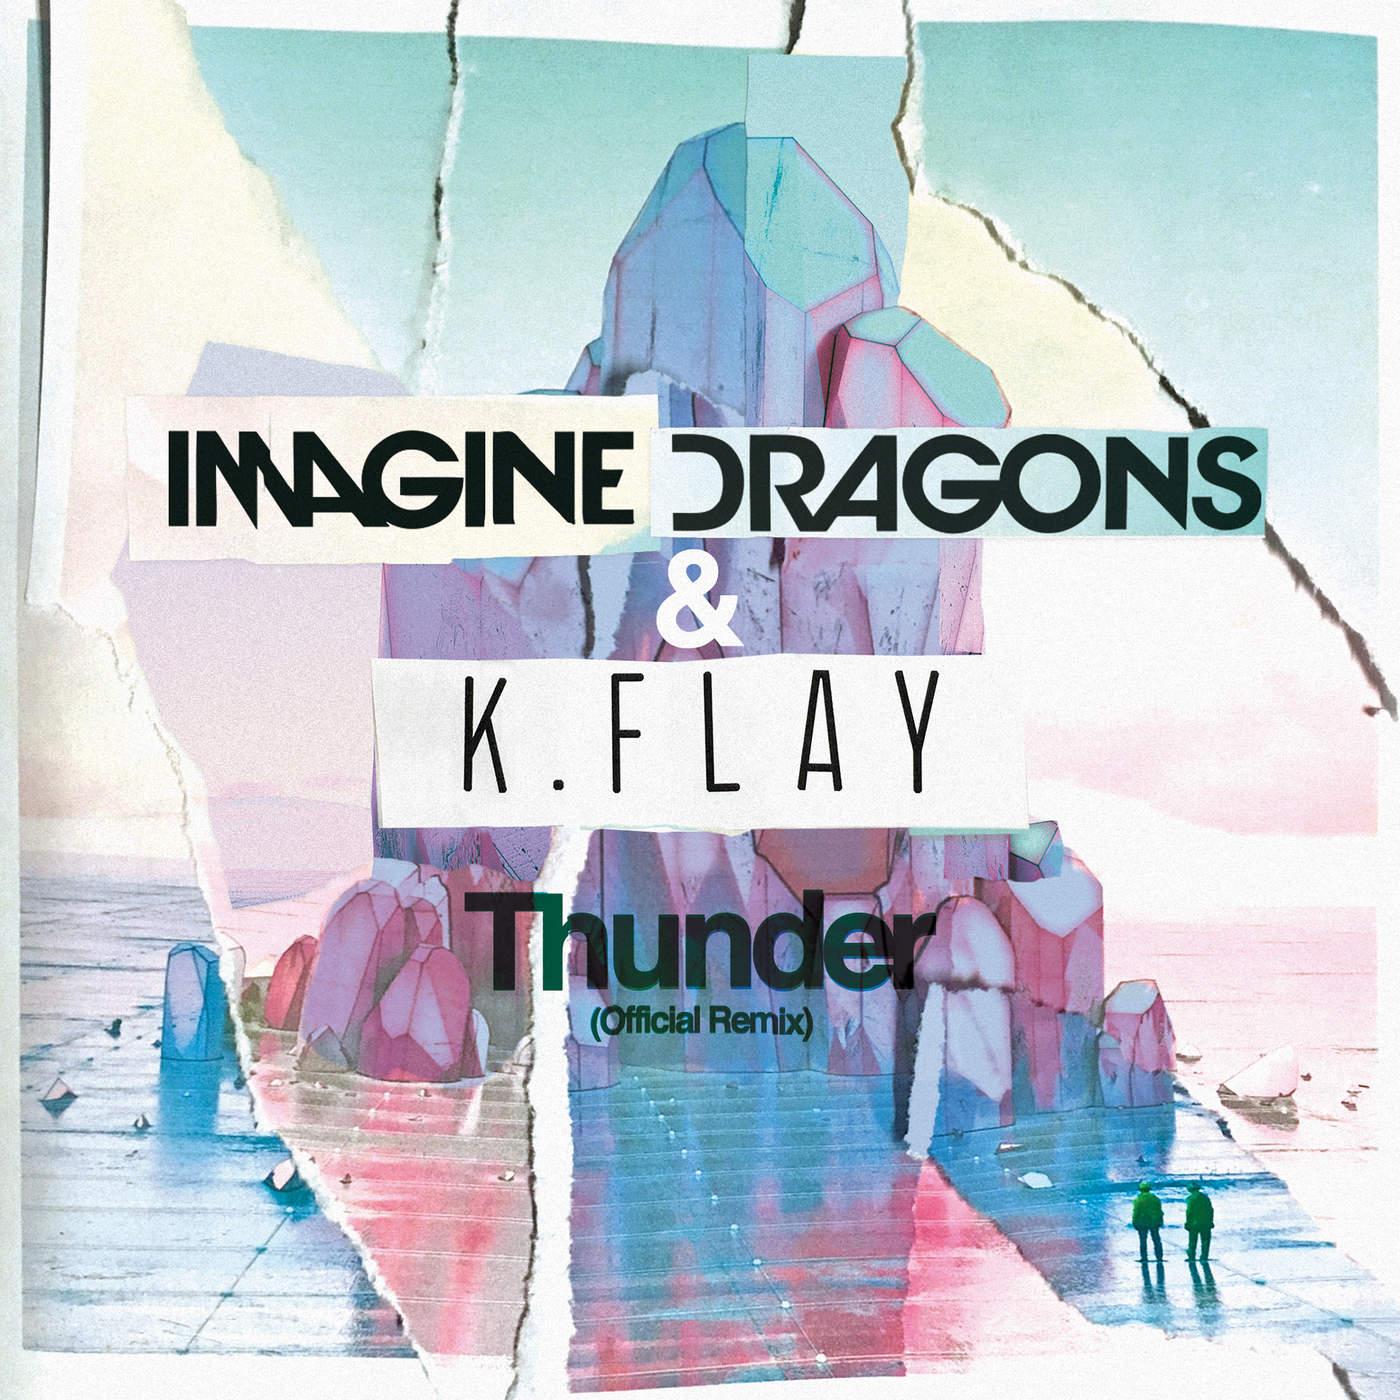 Imagine Dragons & K.Flay - Thunder (Official Remix) - Single